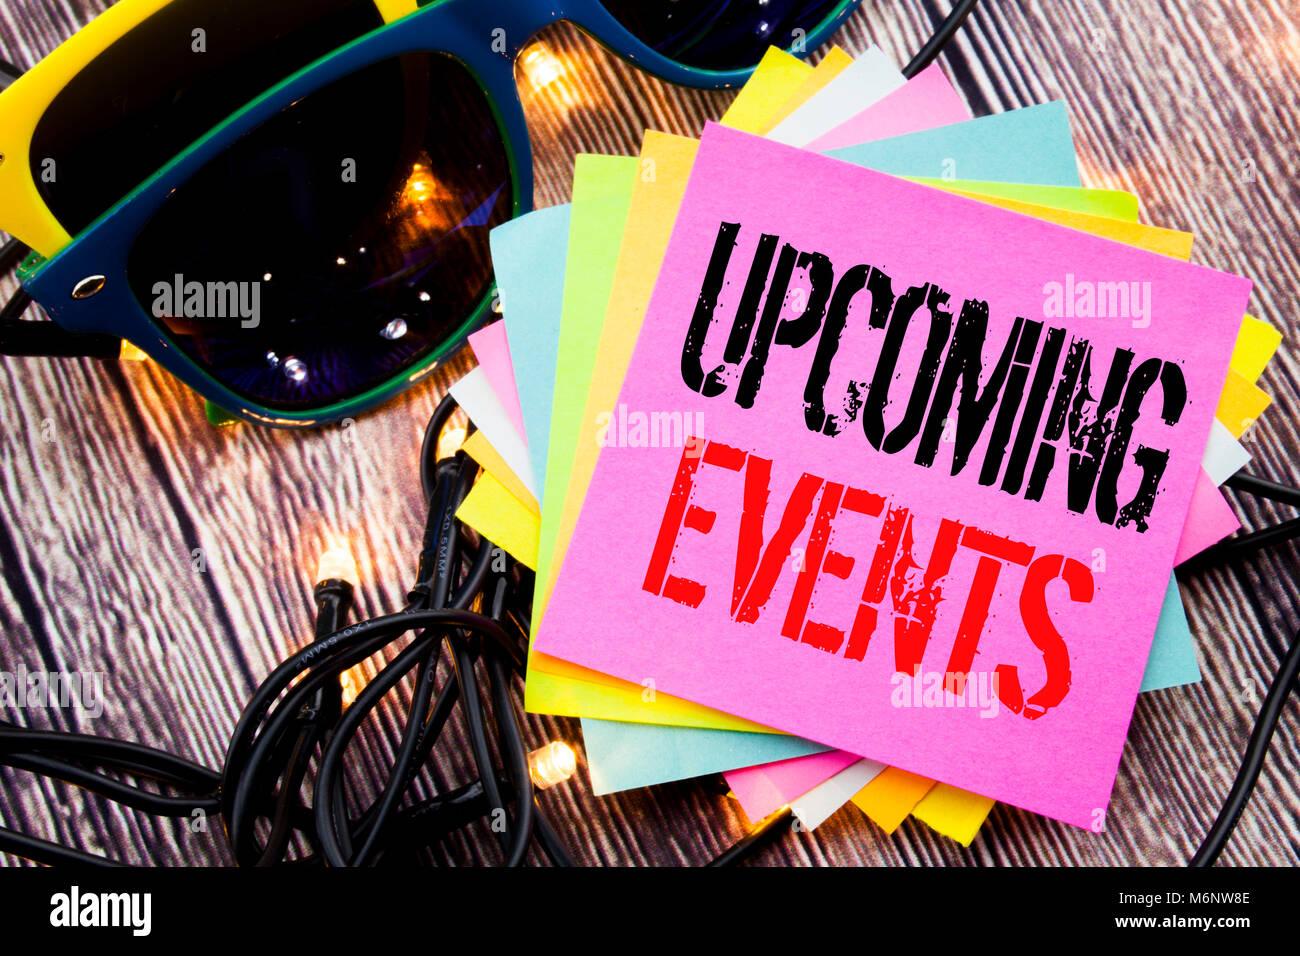 Upcoming Events Imágenes De Stock & Upcoming Events Fotos De Stock ...